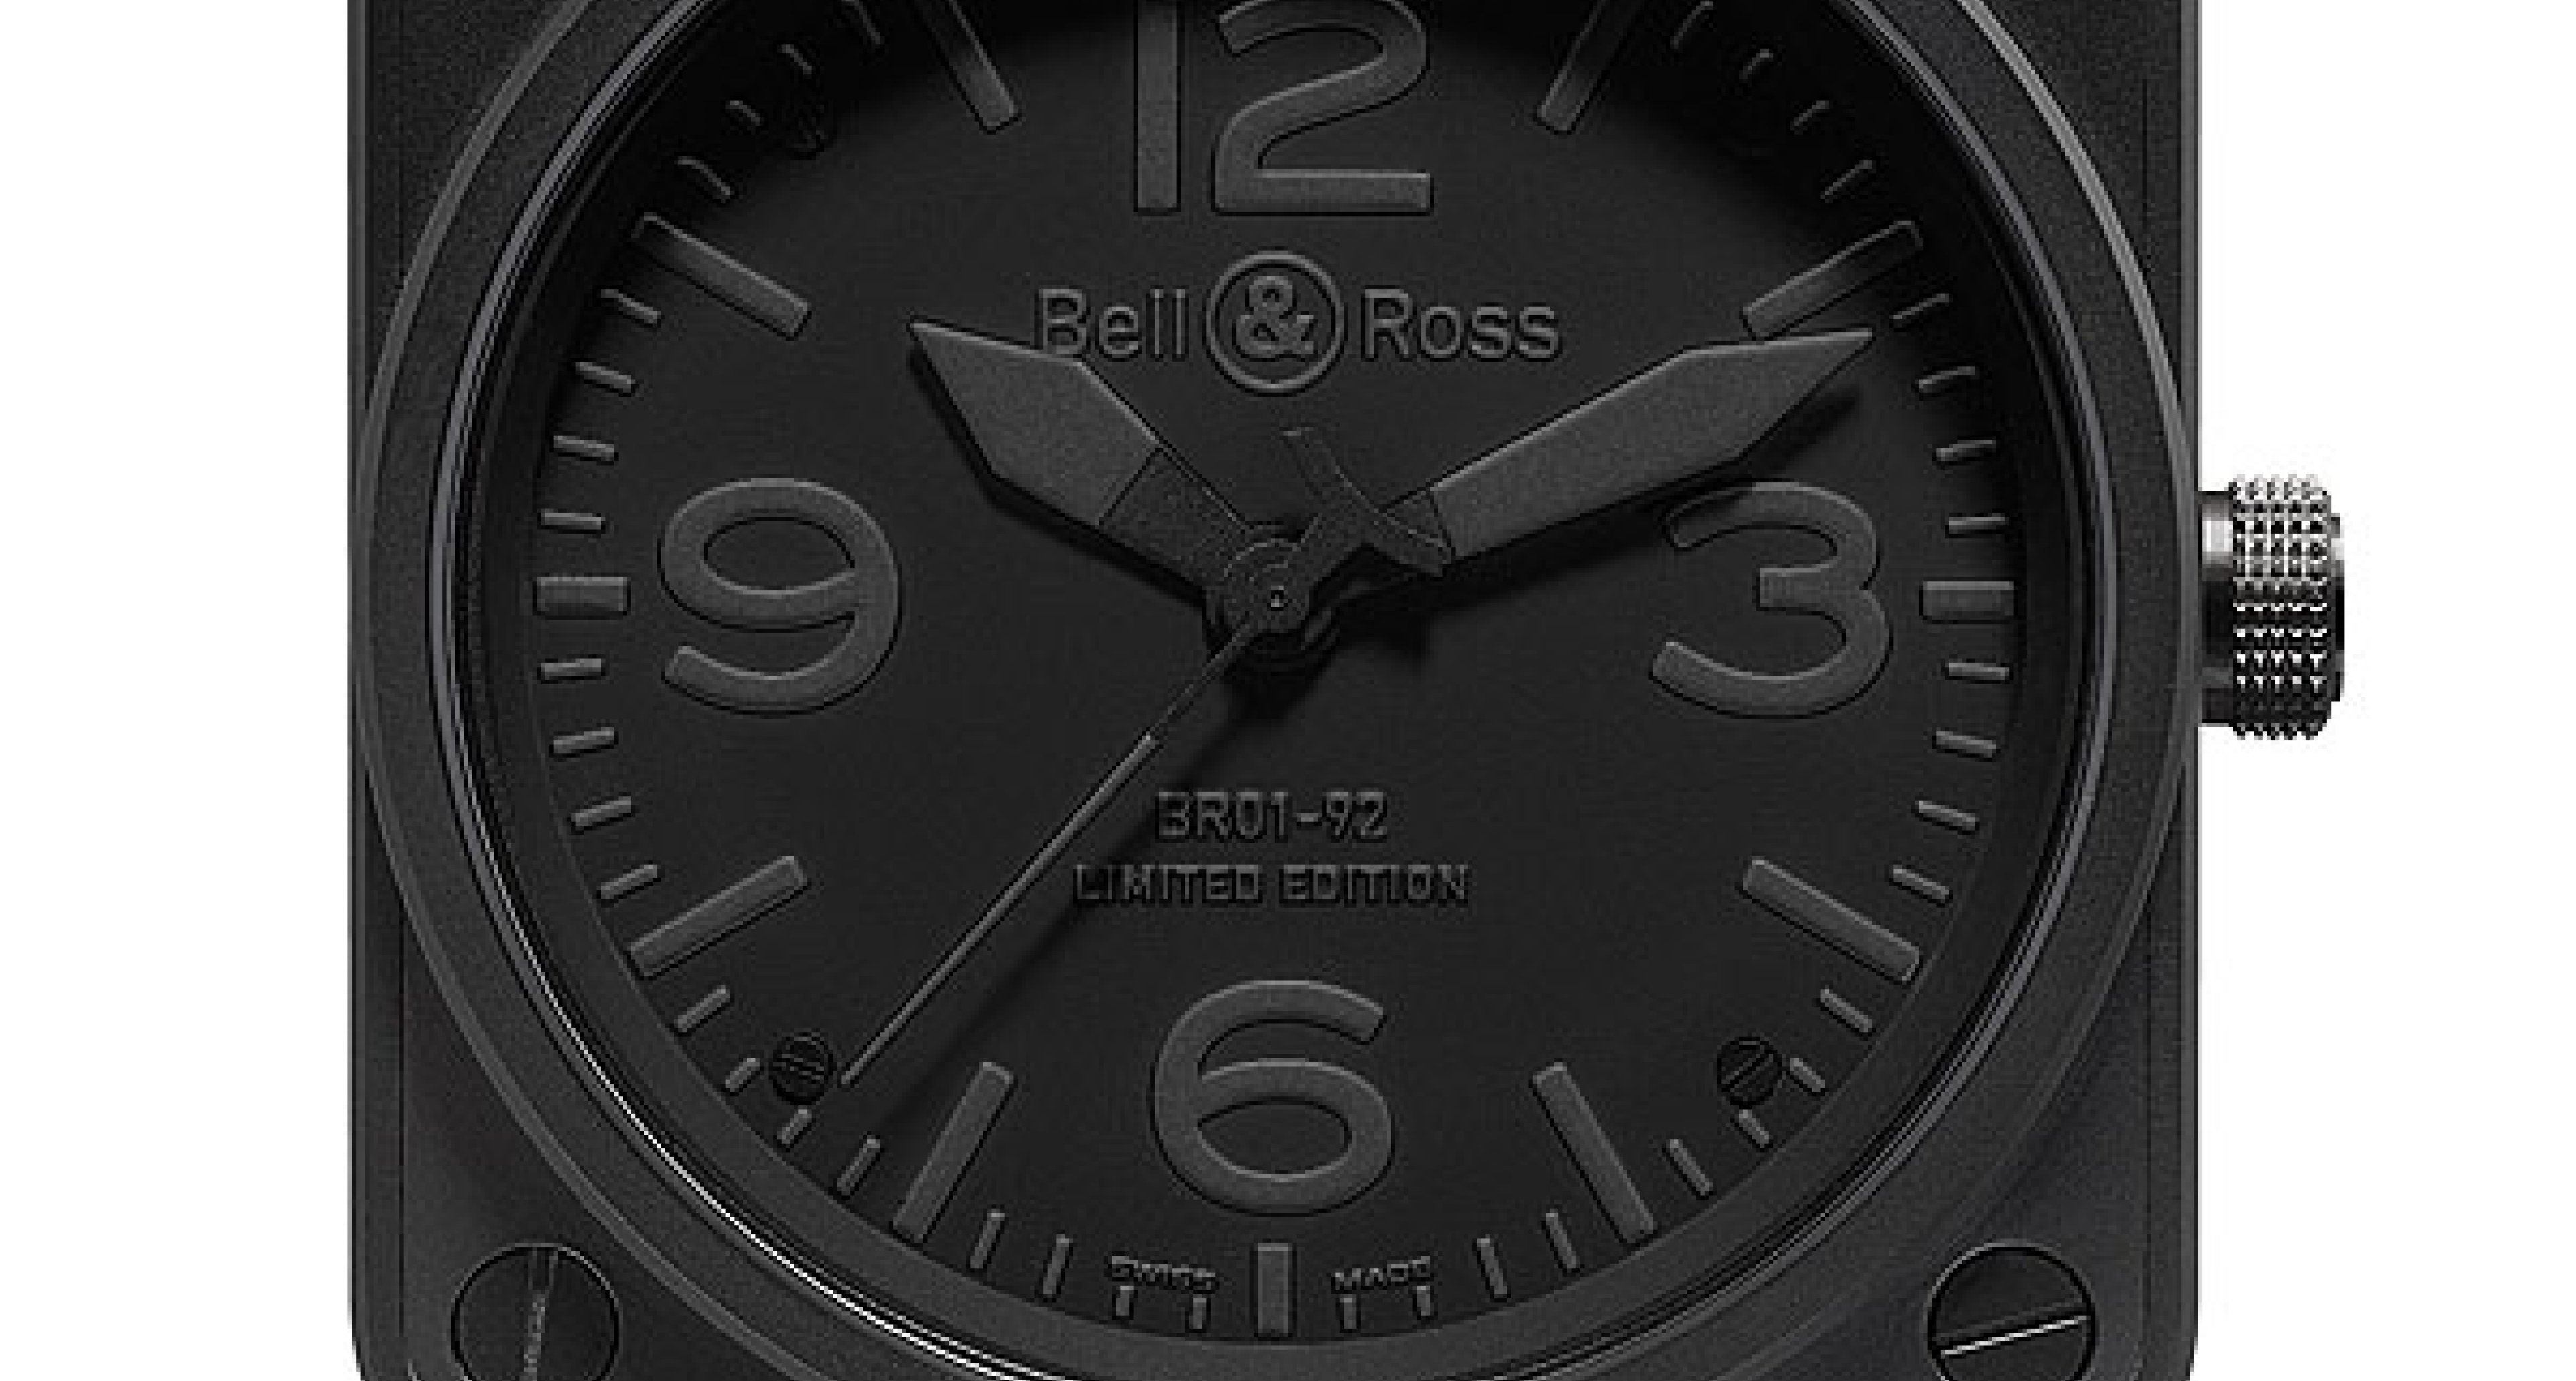 Bell & Ross Instrument 2007: A New Colour Palette